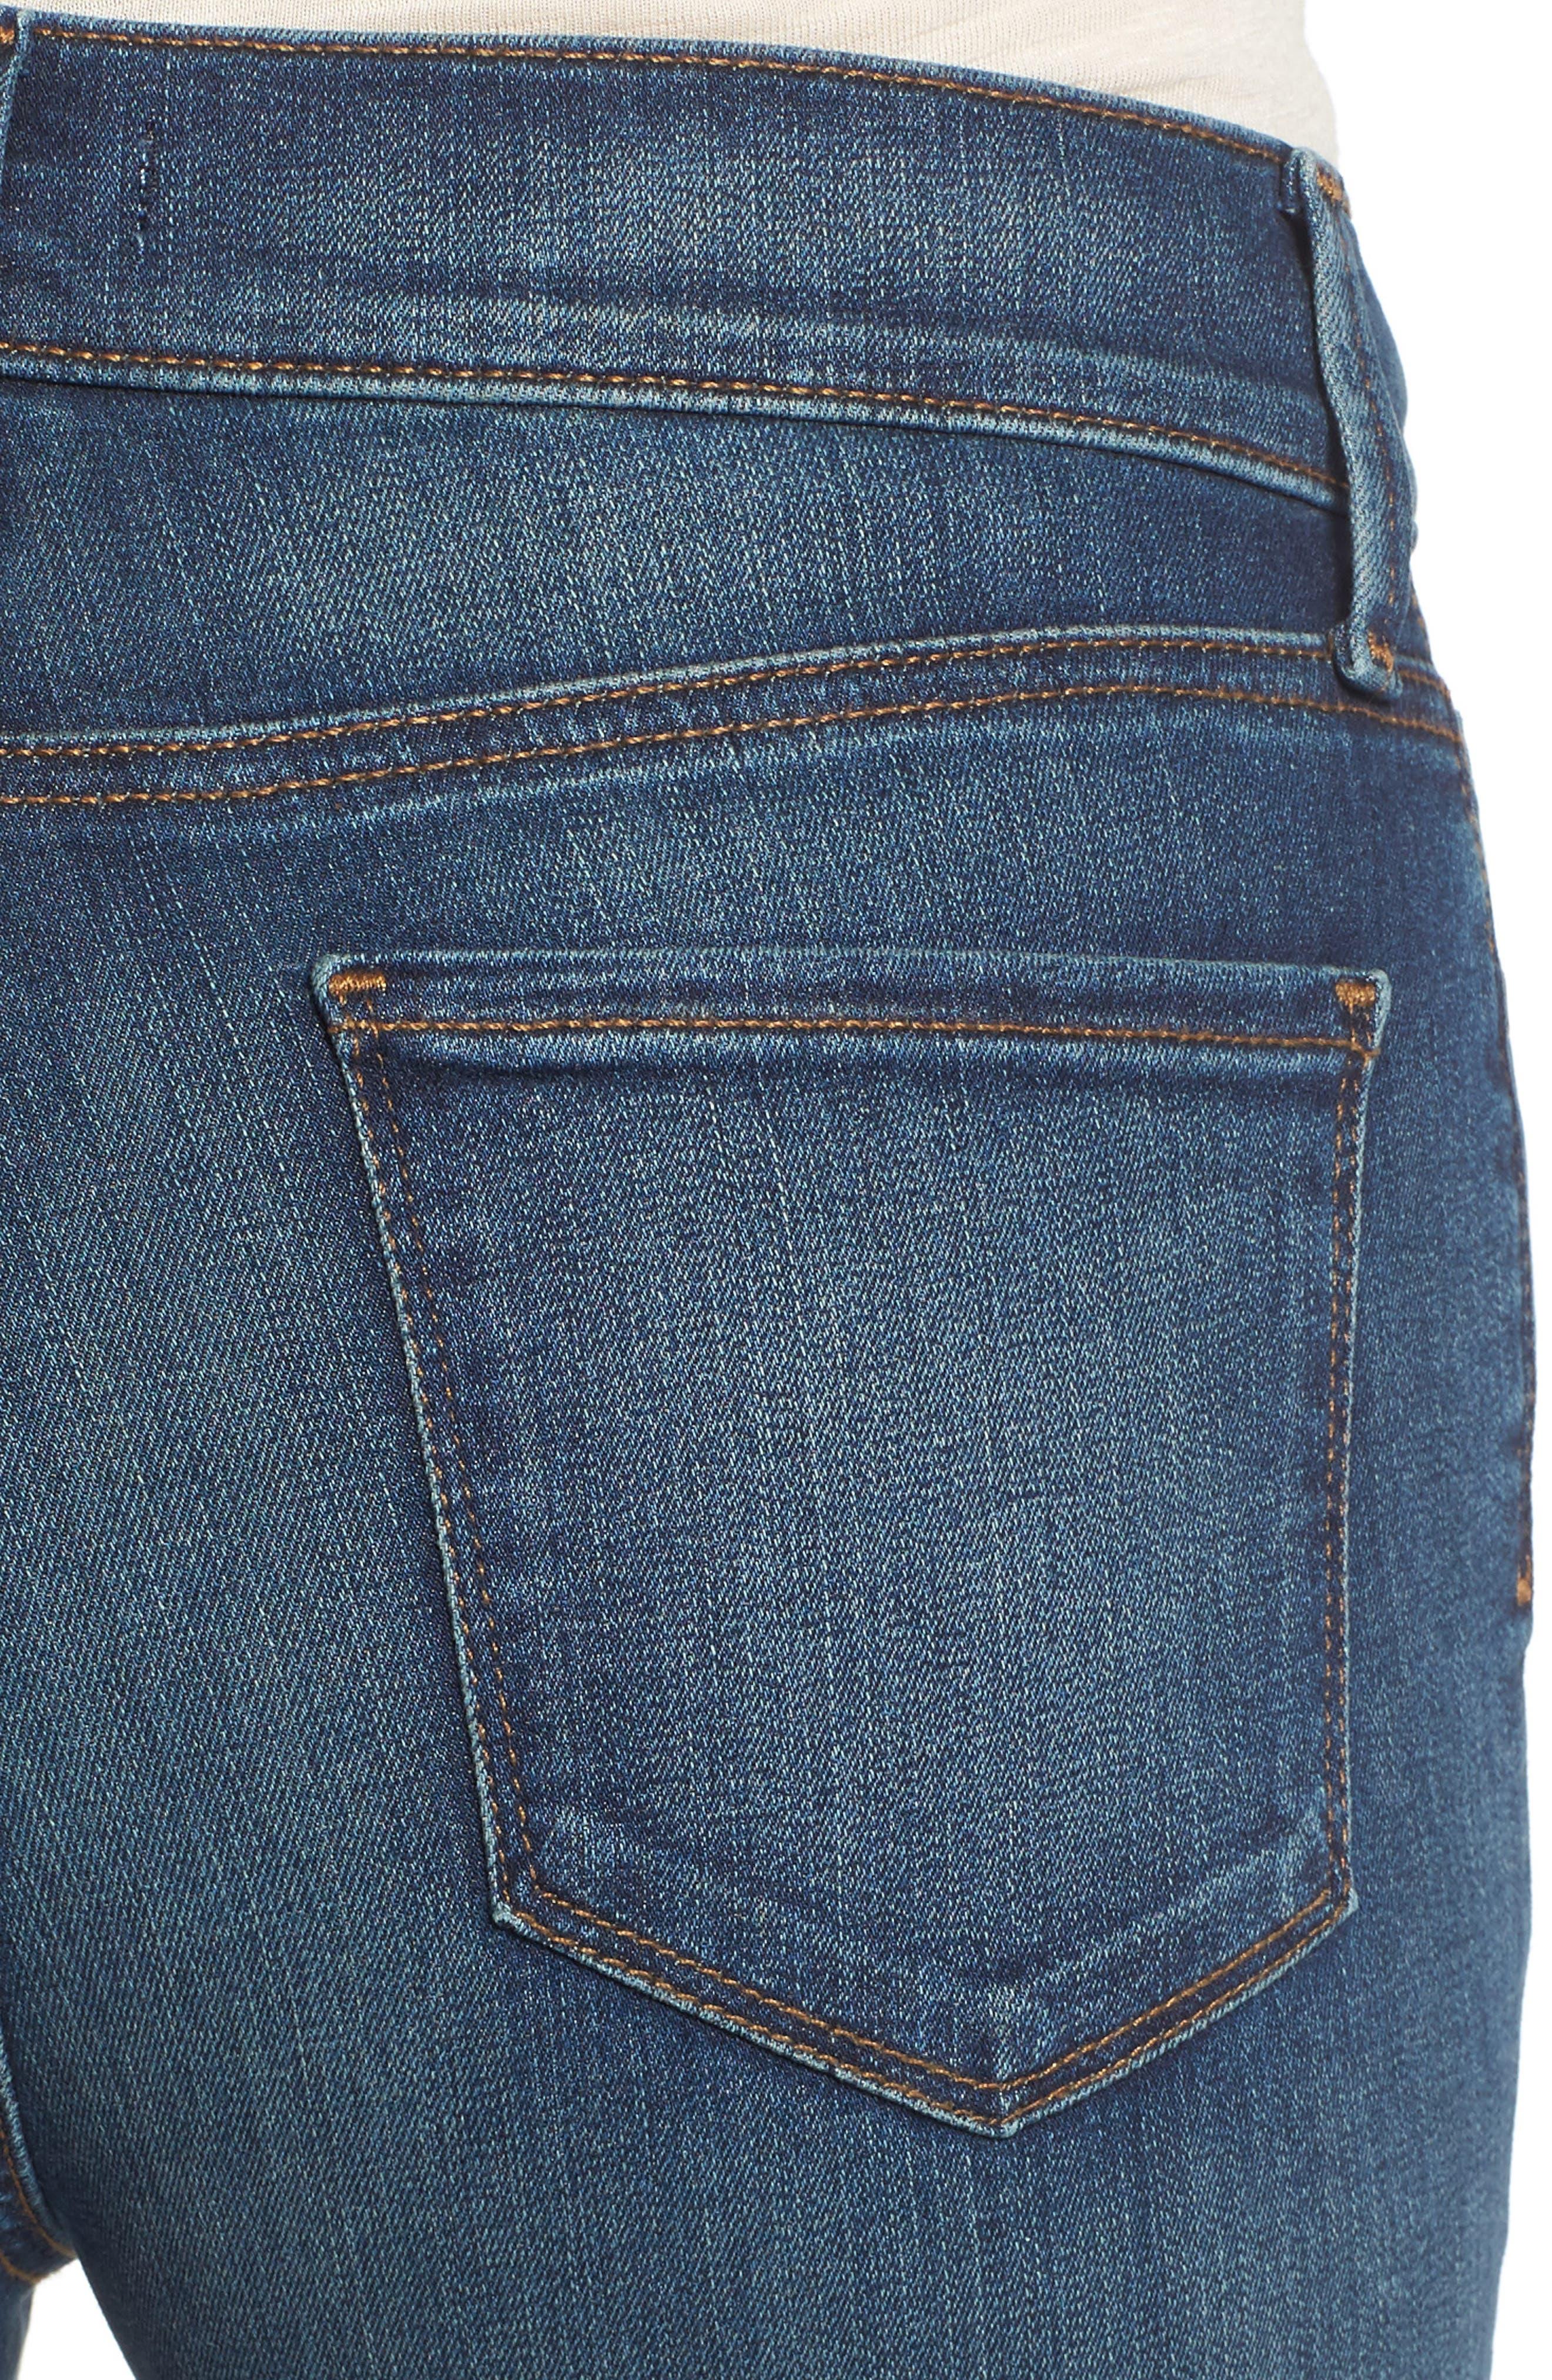 'Dayla' Colored Wide Cuff Capri Jeans,                             Alternate thumbnail 53, color,